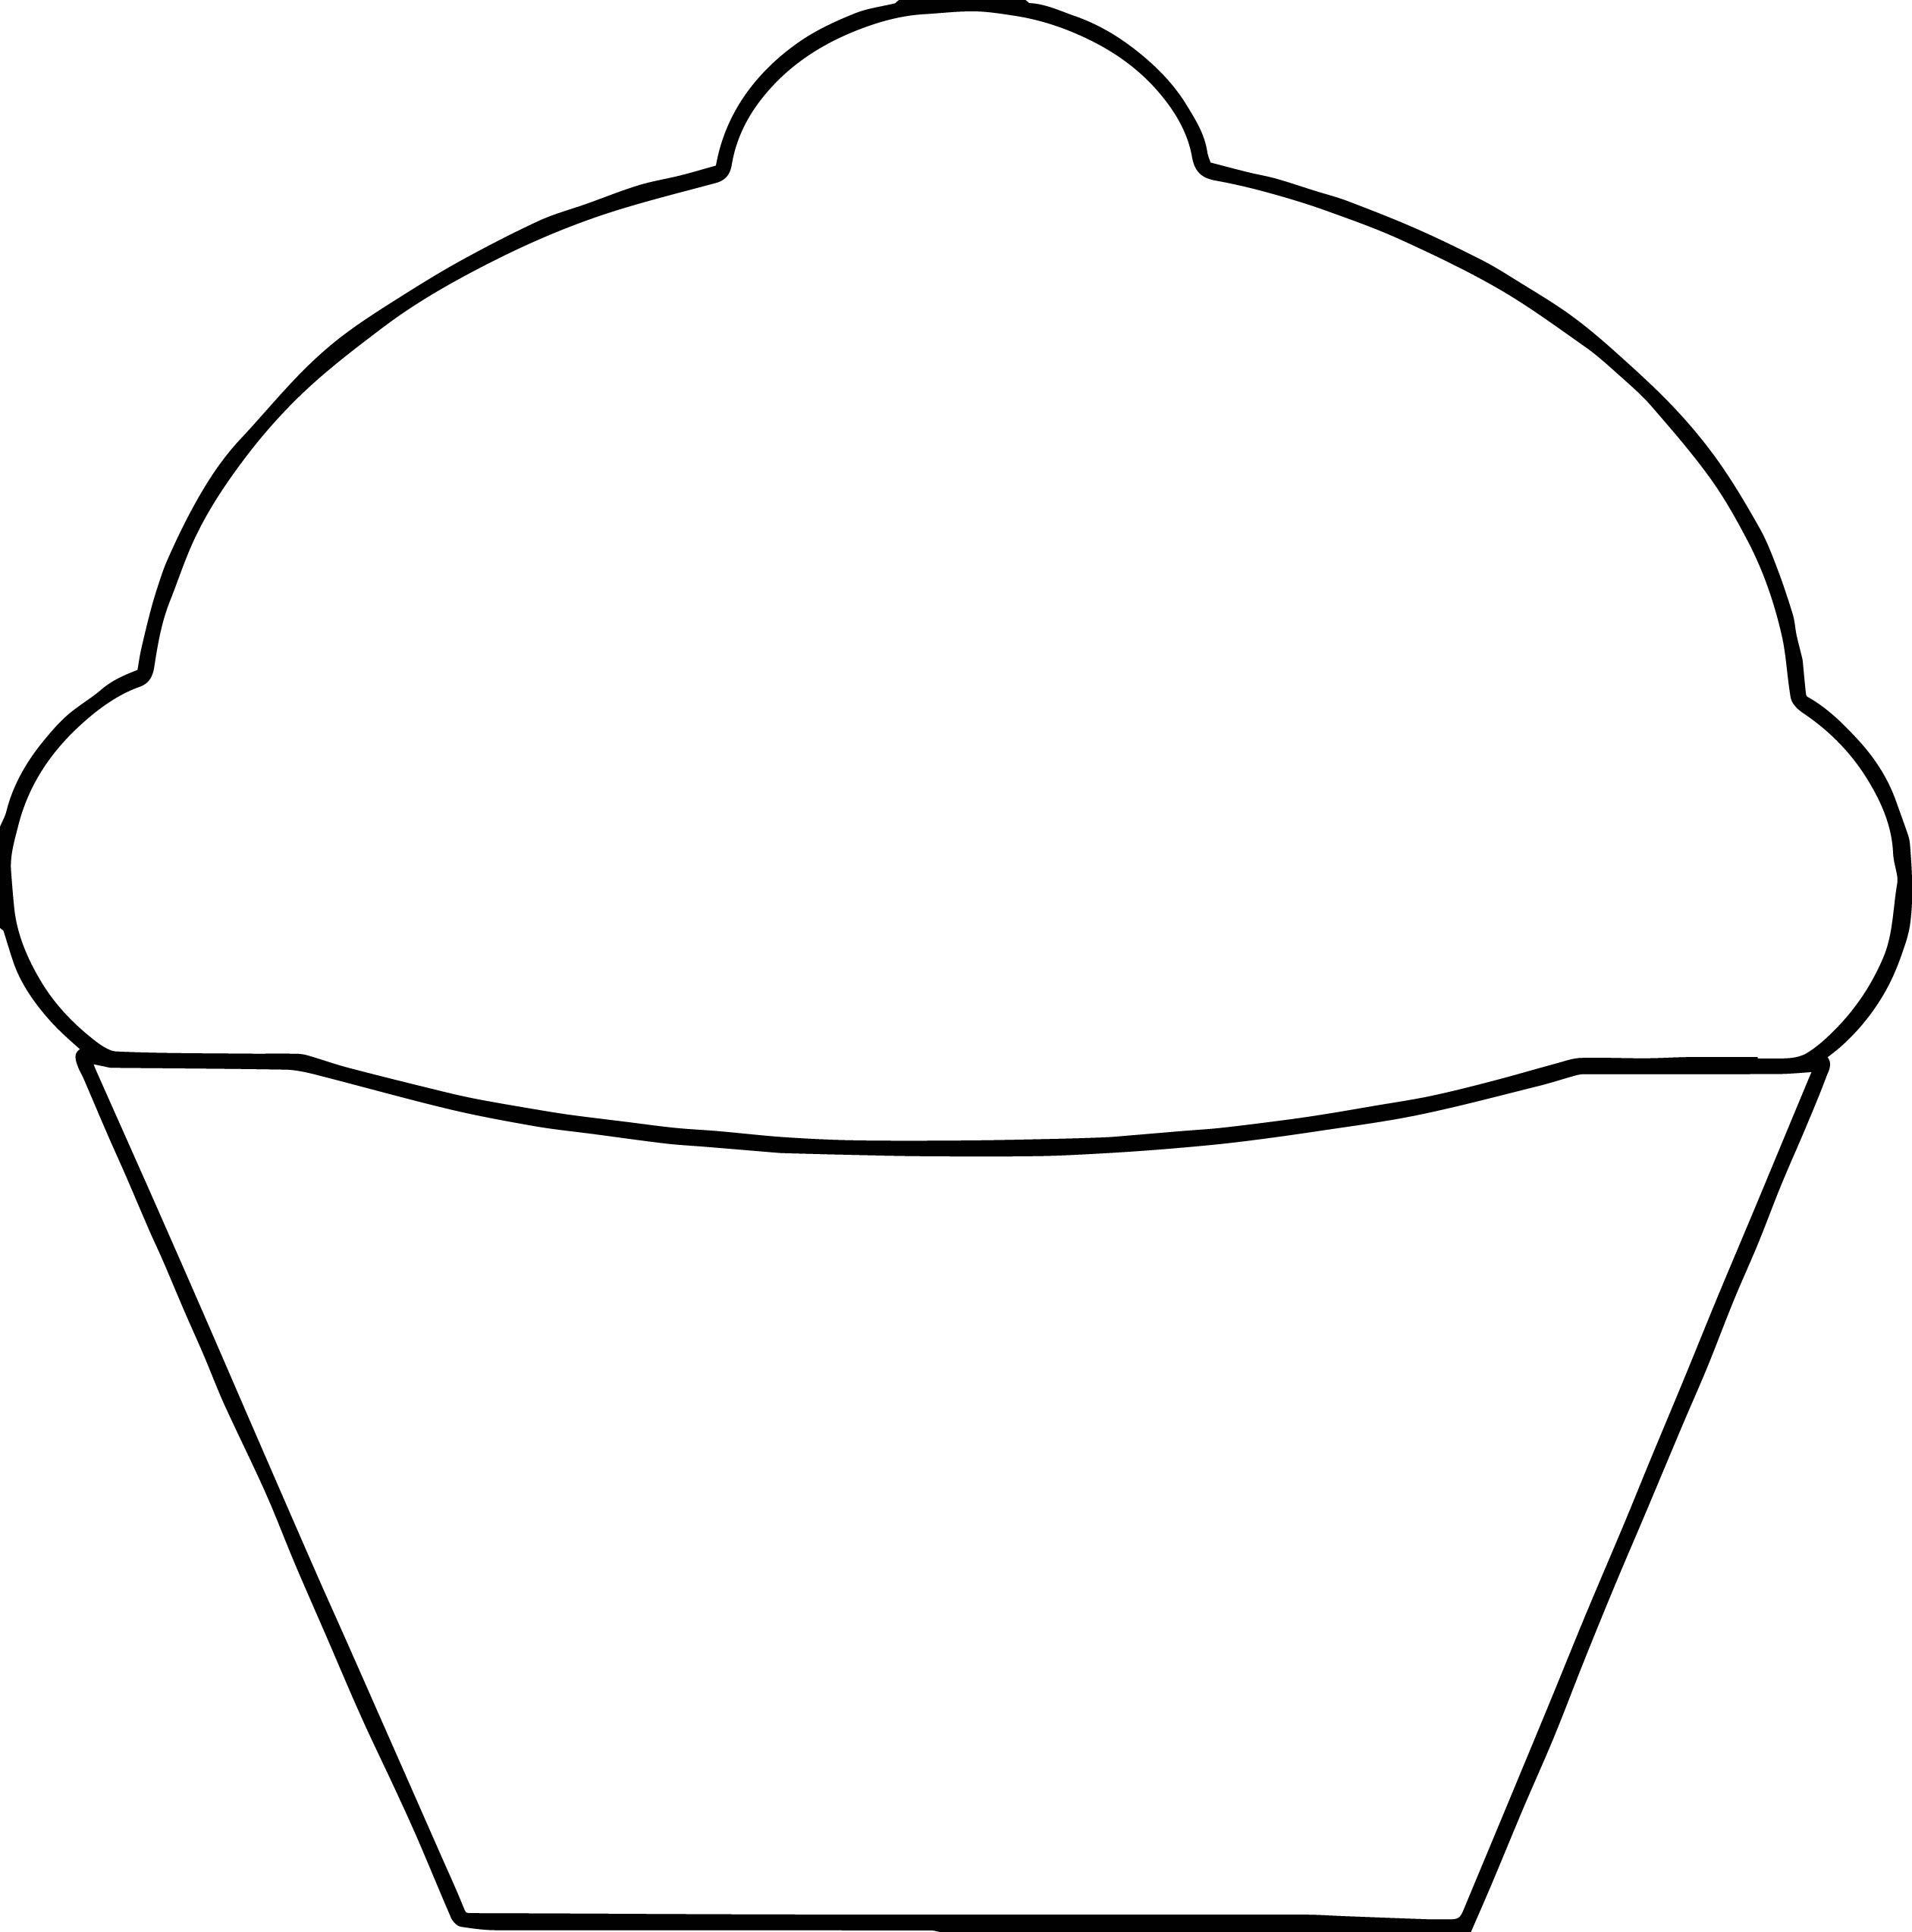 Basic Empty Cupcake Coloring Page Cupcake Coloring Pages Easy Coloring Pages Coloring Pages